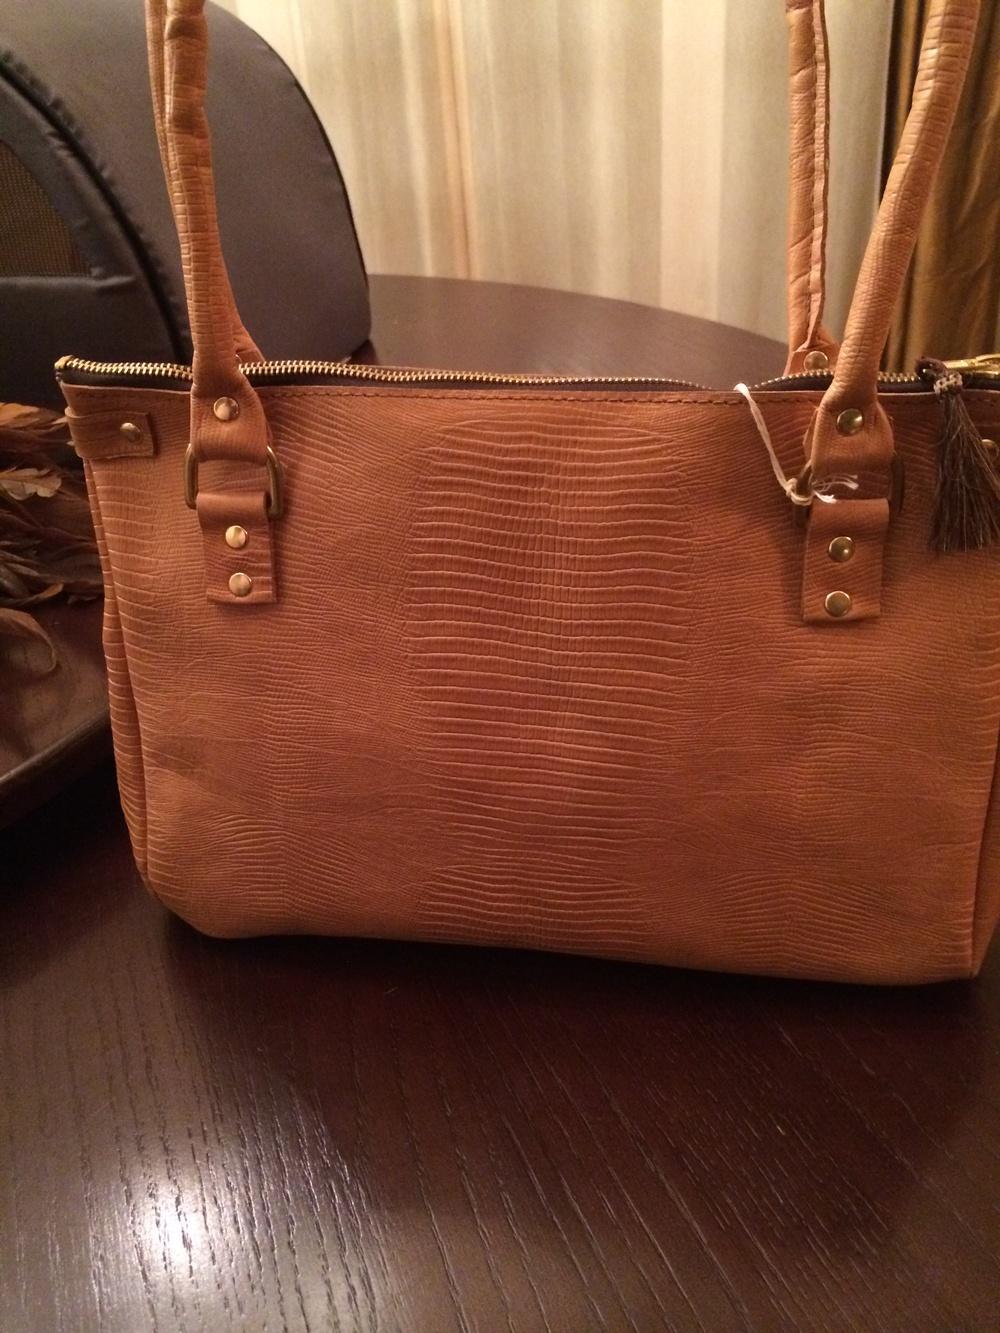 Textured Leather Handbag